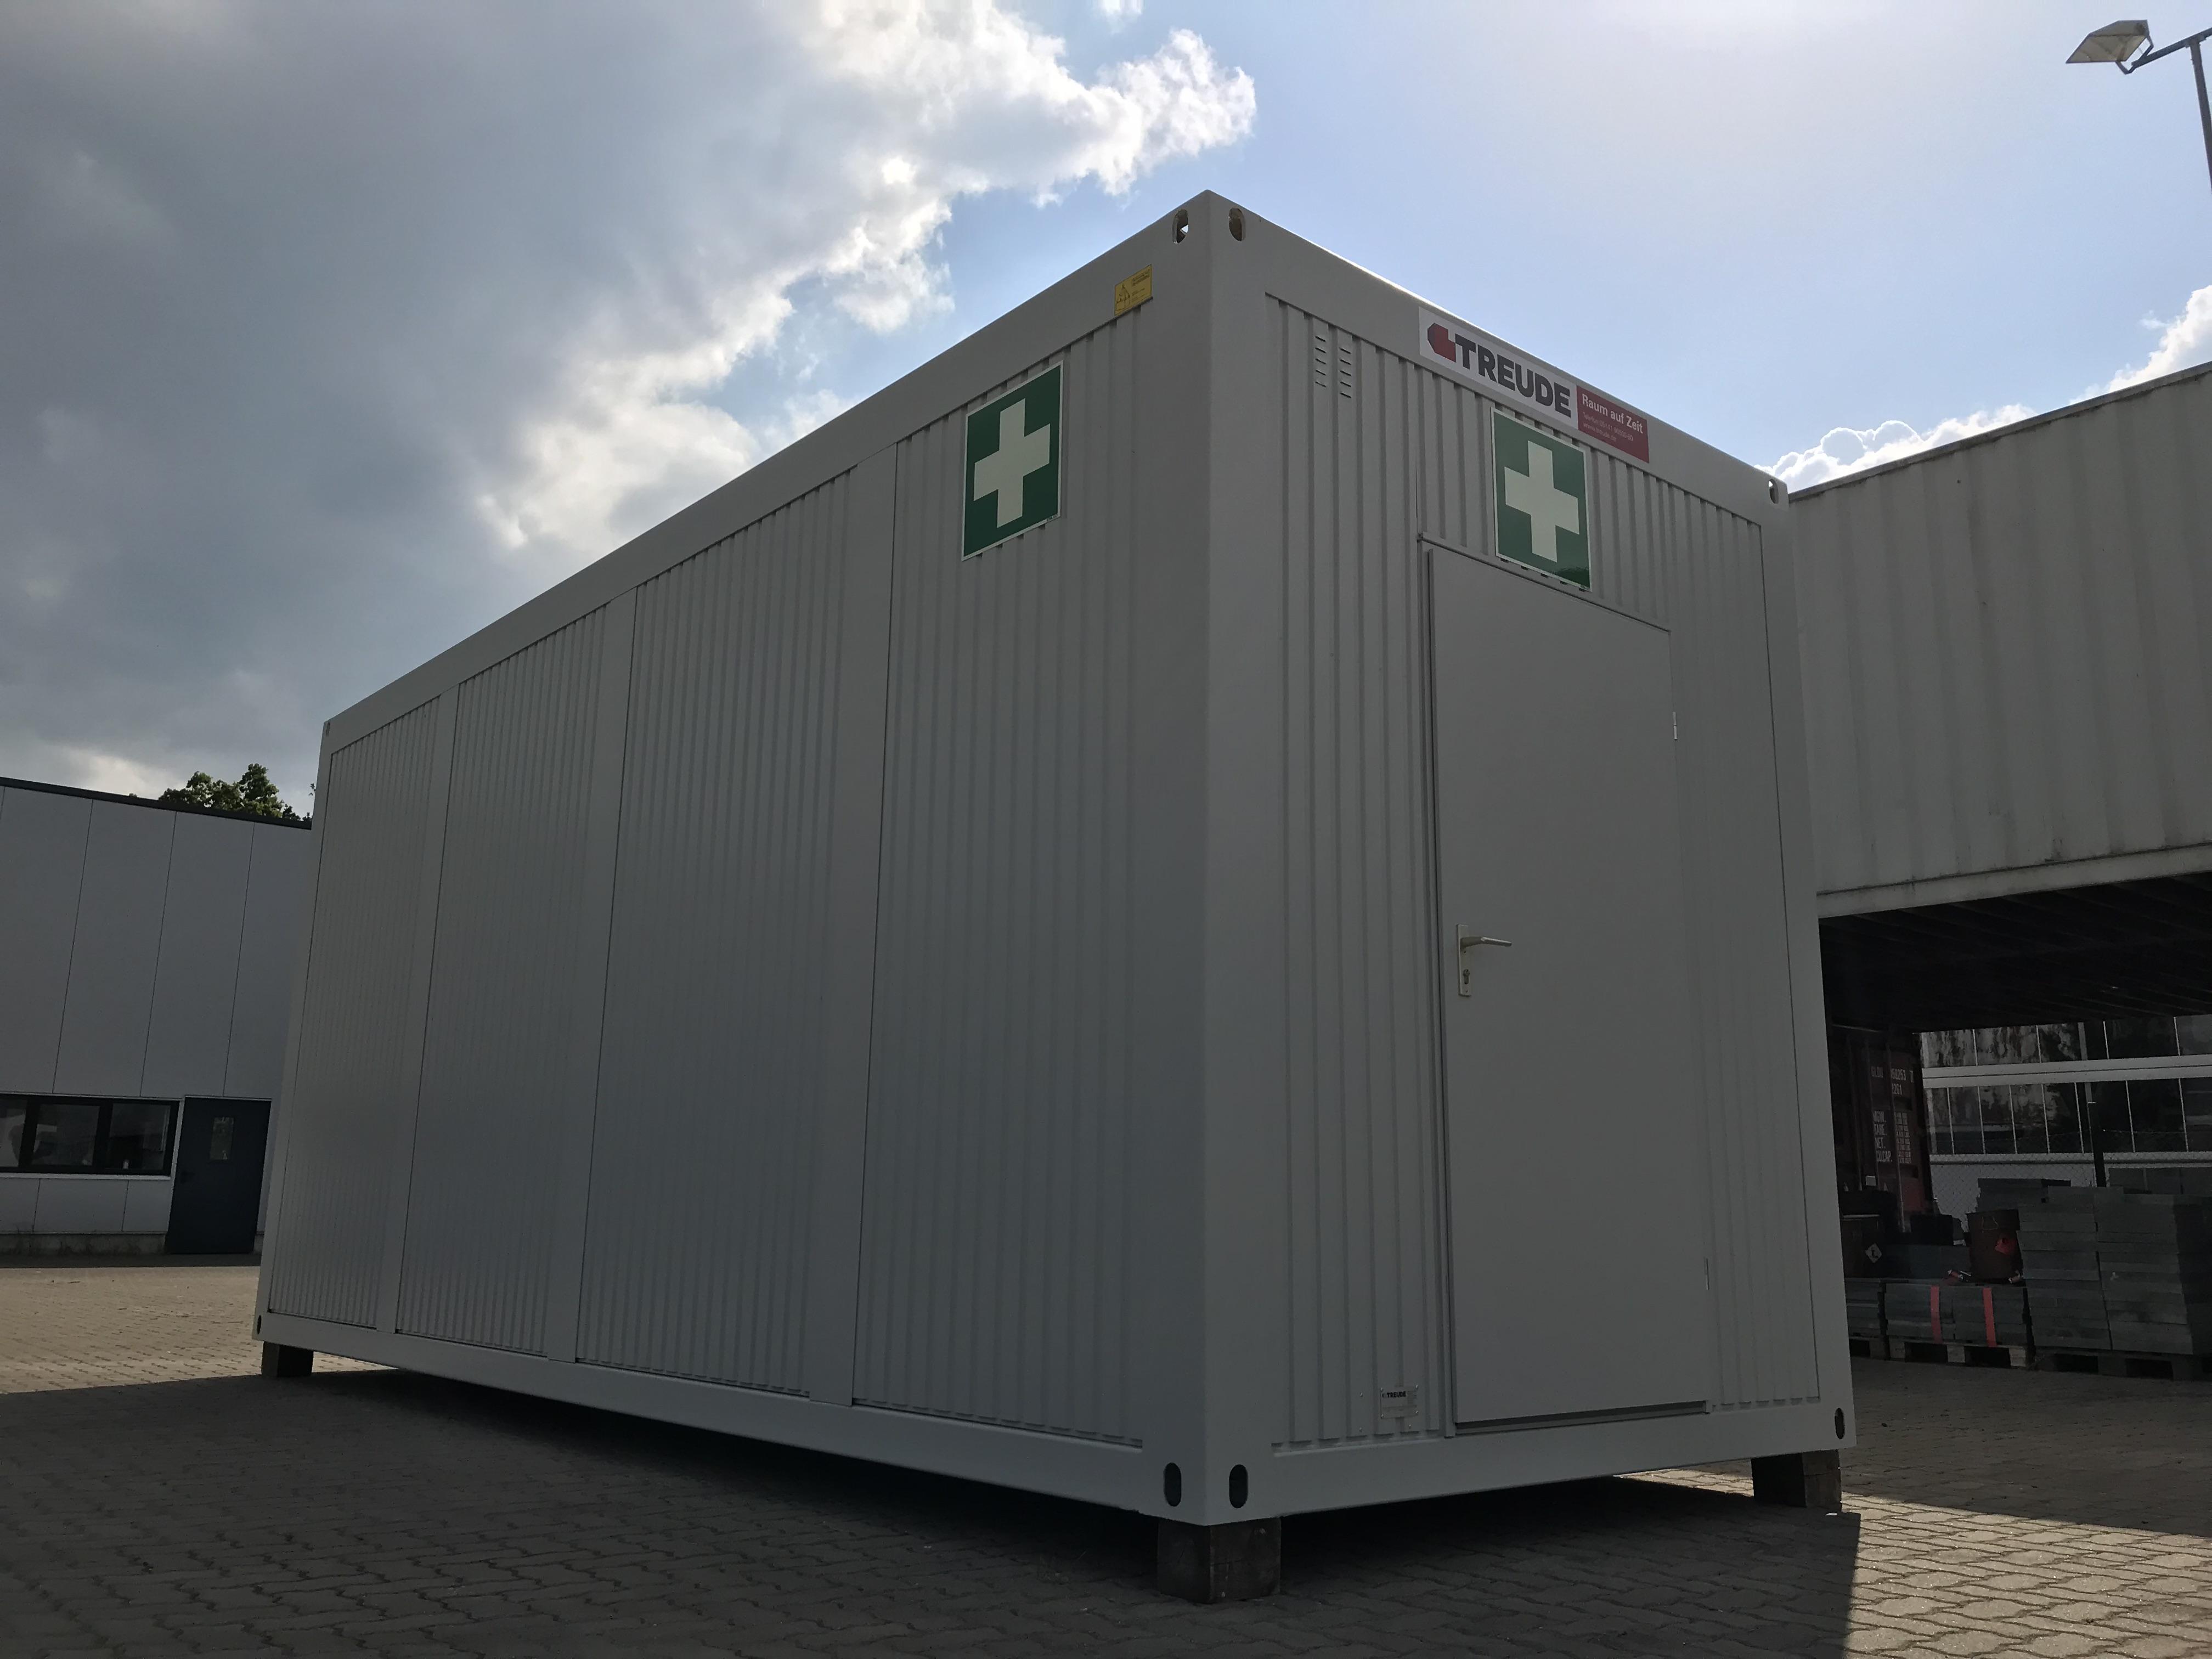 sanitaetscontainer_2018